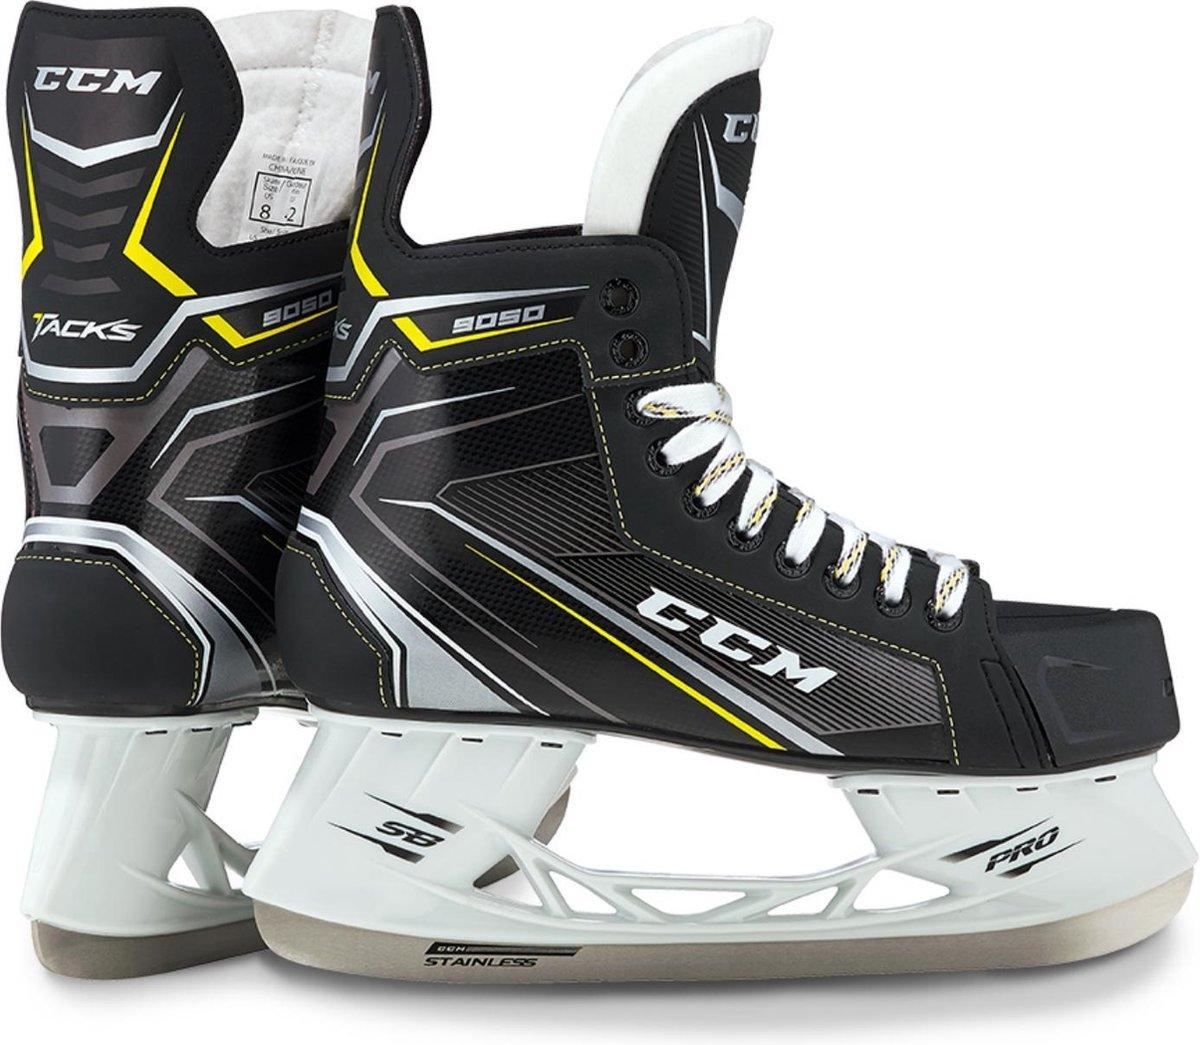 CCM IJshockeyschaatsen TACKS 9050 SR Zwart 39